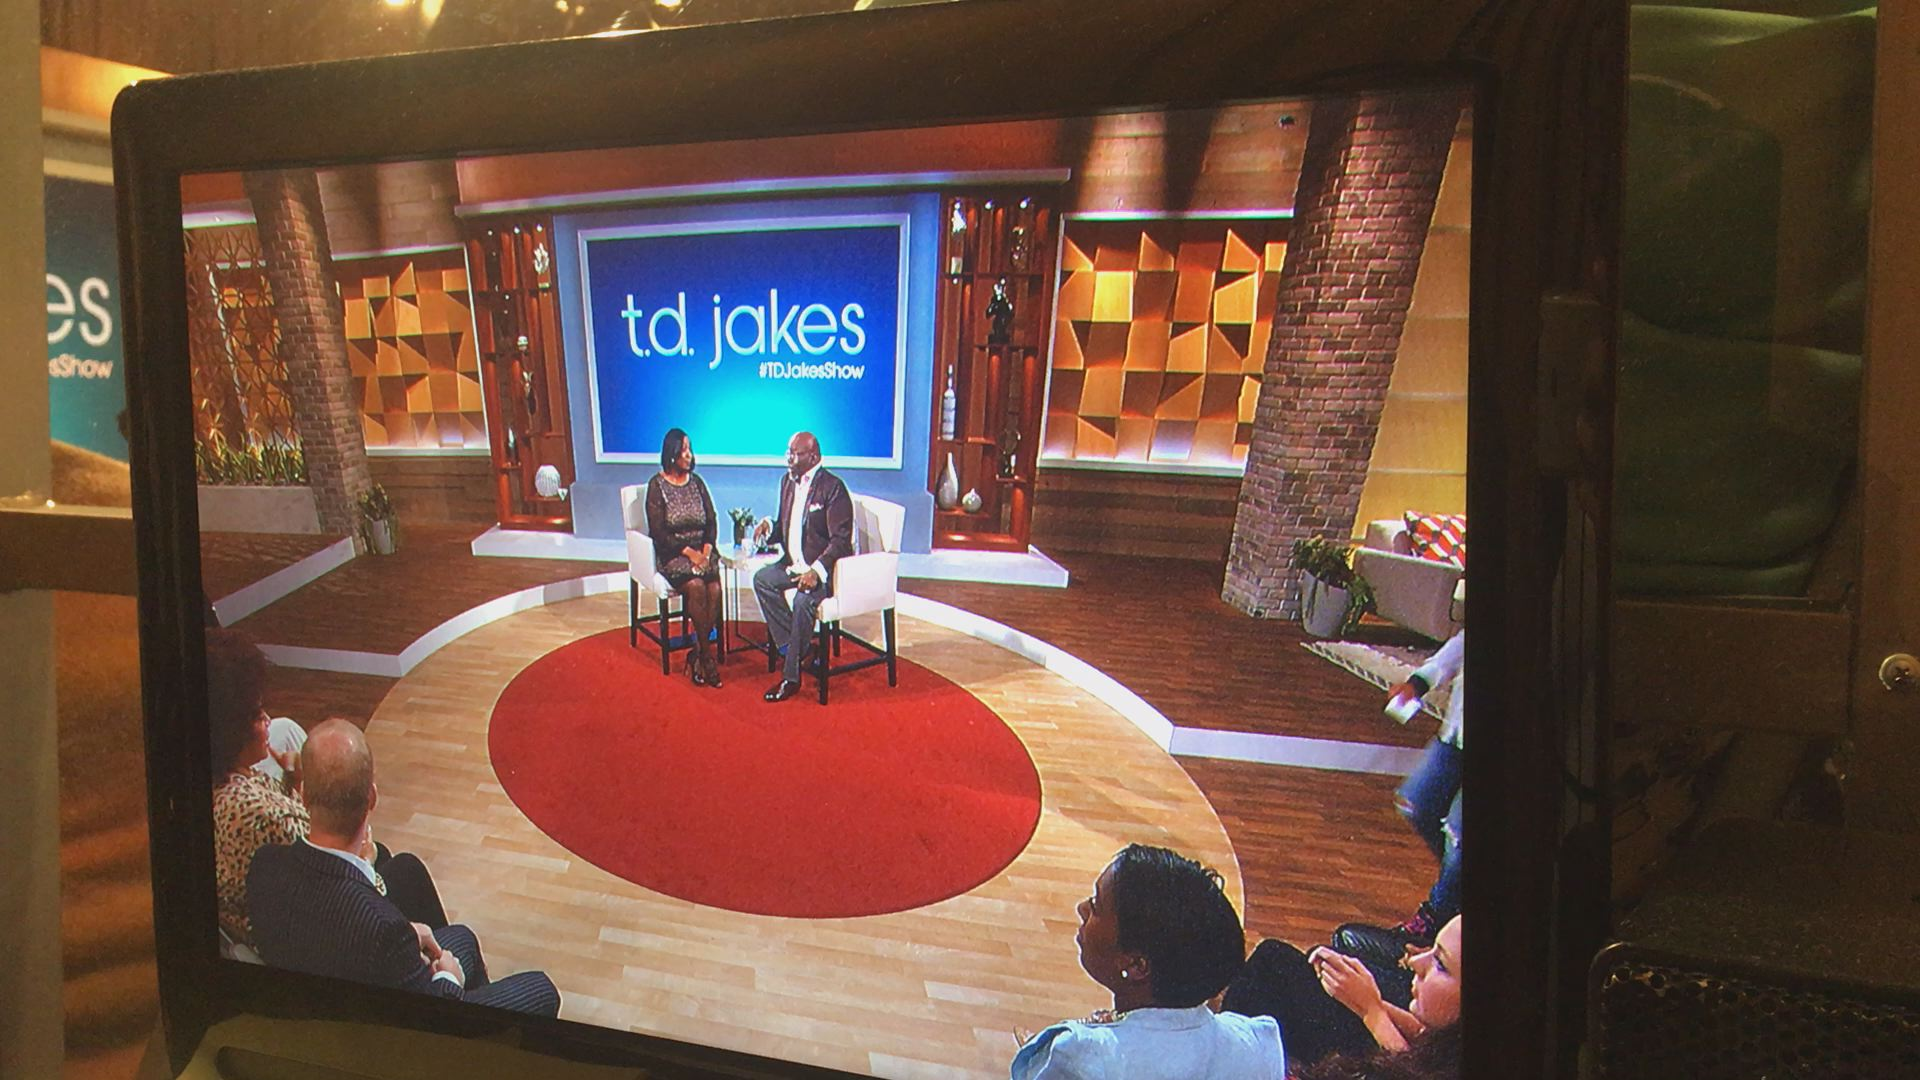 TD Jakes Americas New Preacher Shayne Lee